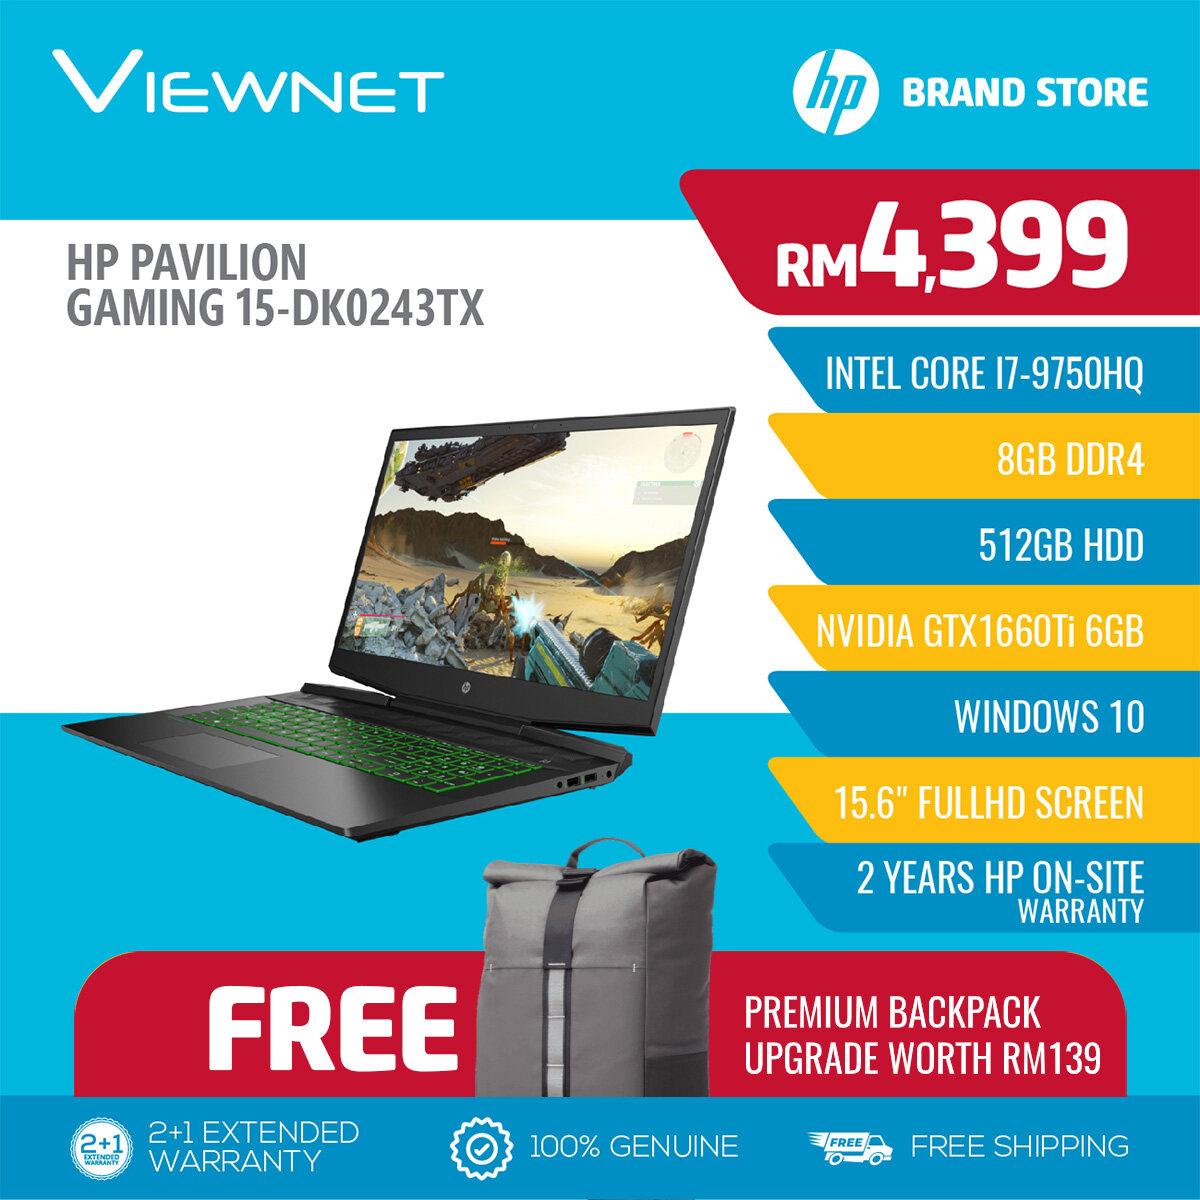 HP PAVILION GAMING 15-DK0243TX (I7-9750H/8GB/512GB SSD/GTX 1660 Ti 6GB/15.6 FHD/W10/2YRS) Malaysia